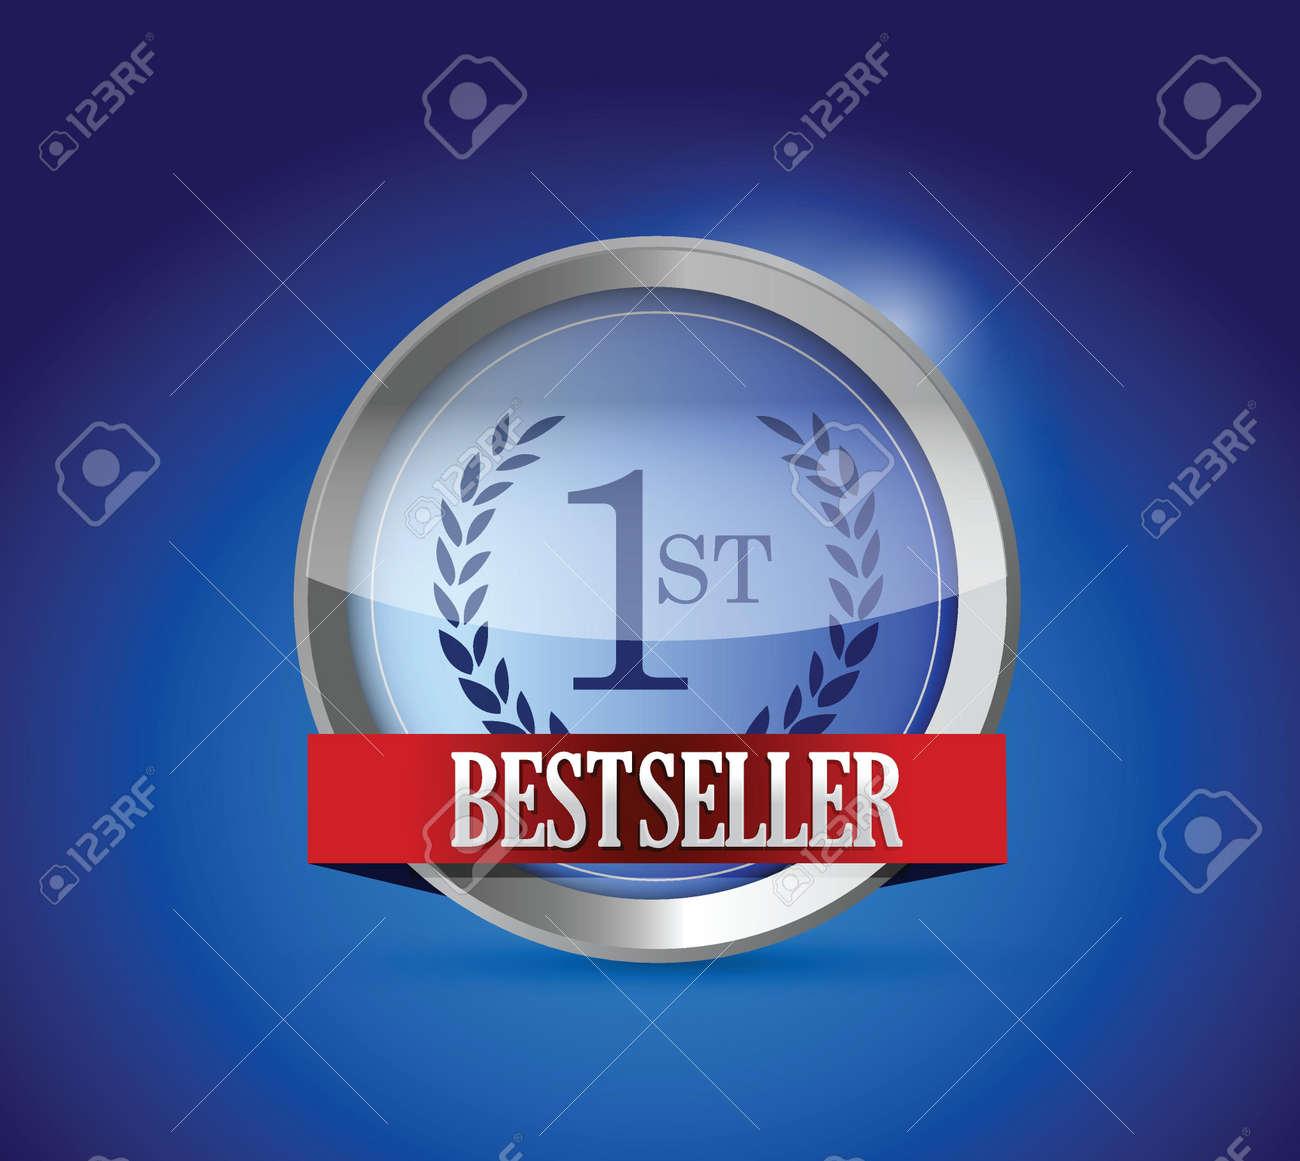 Bestseller button shield illustration design graphic over blue Stock Vector - 20387308